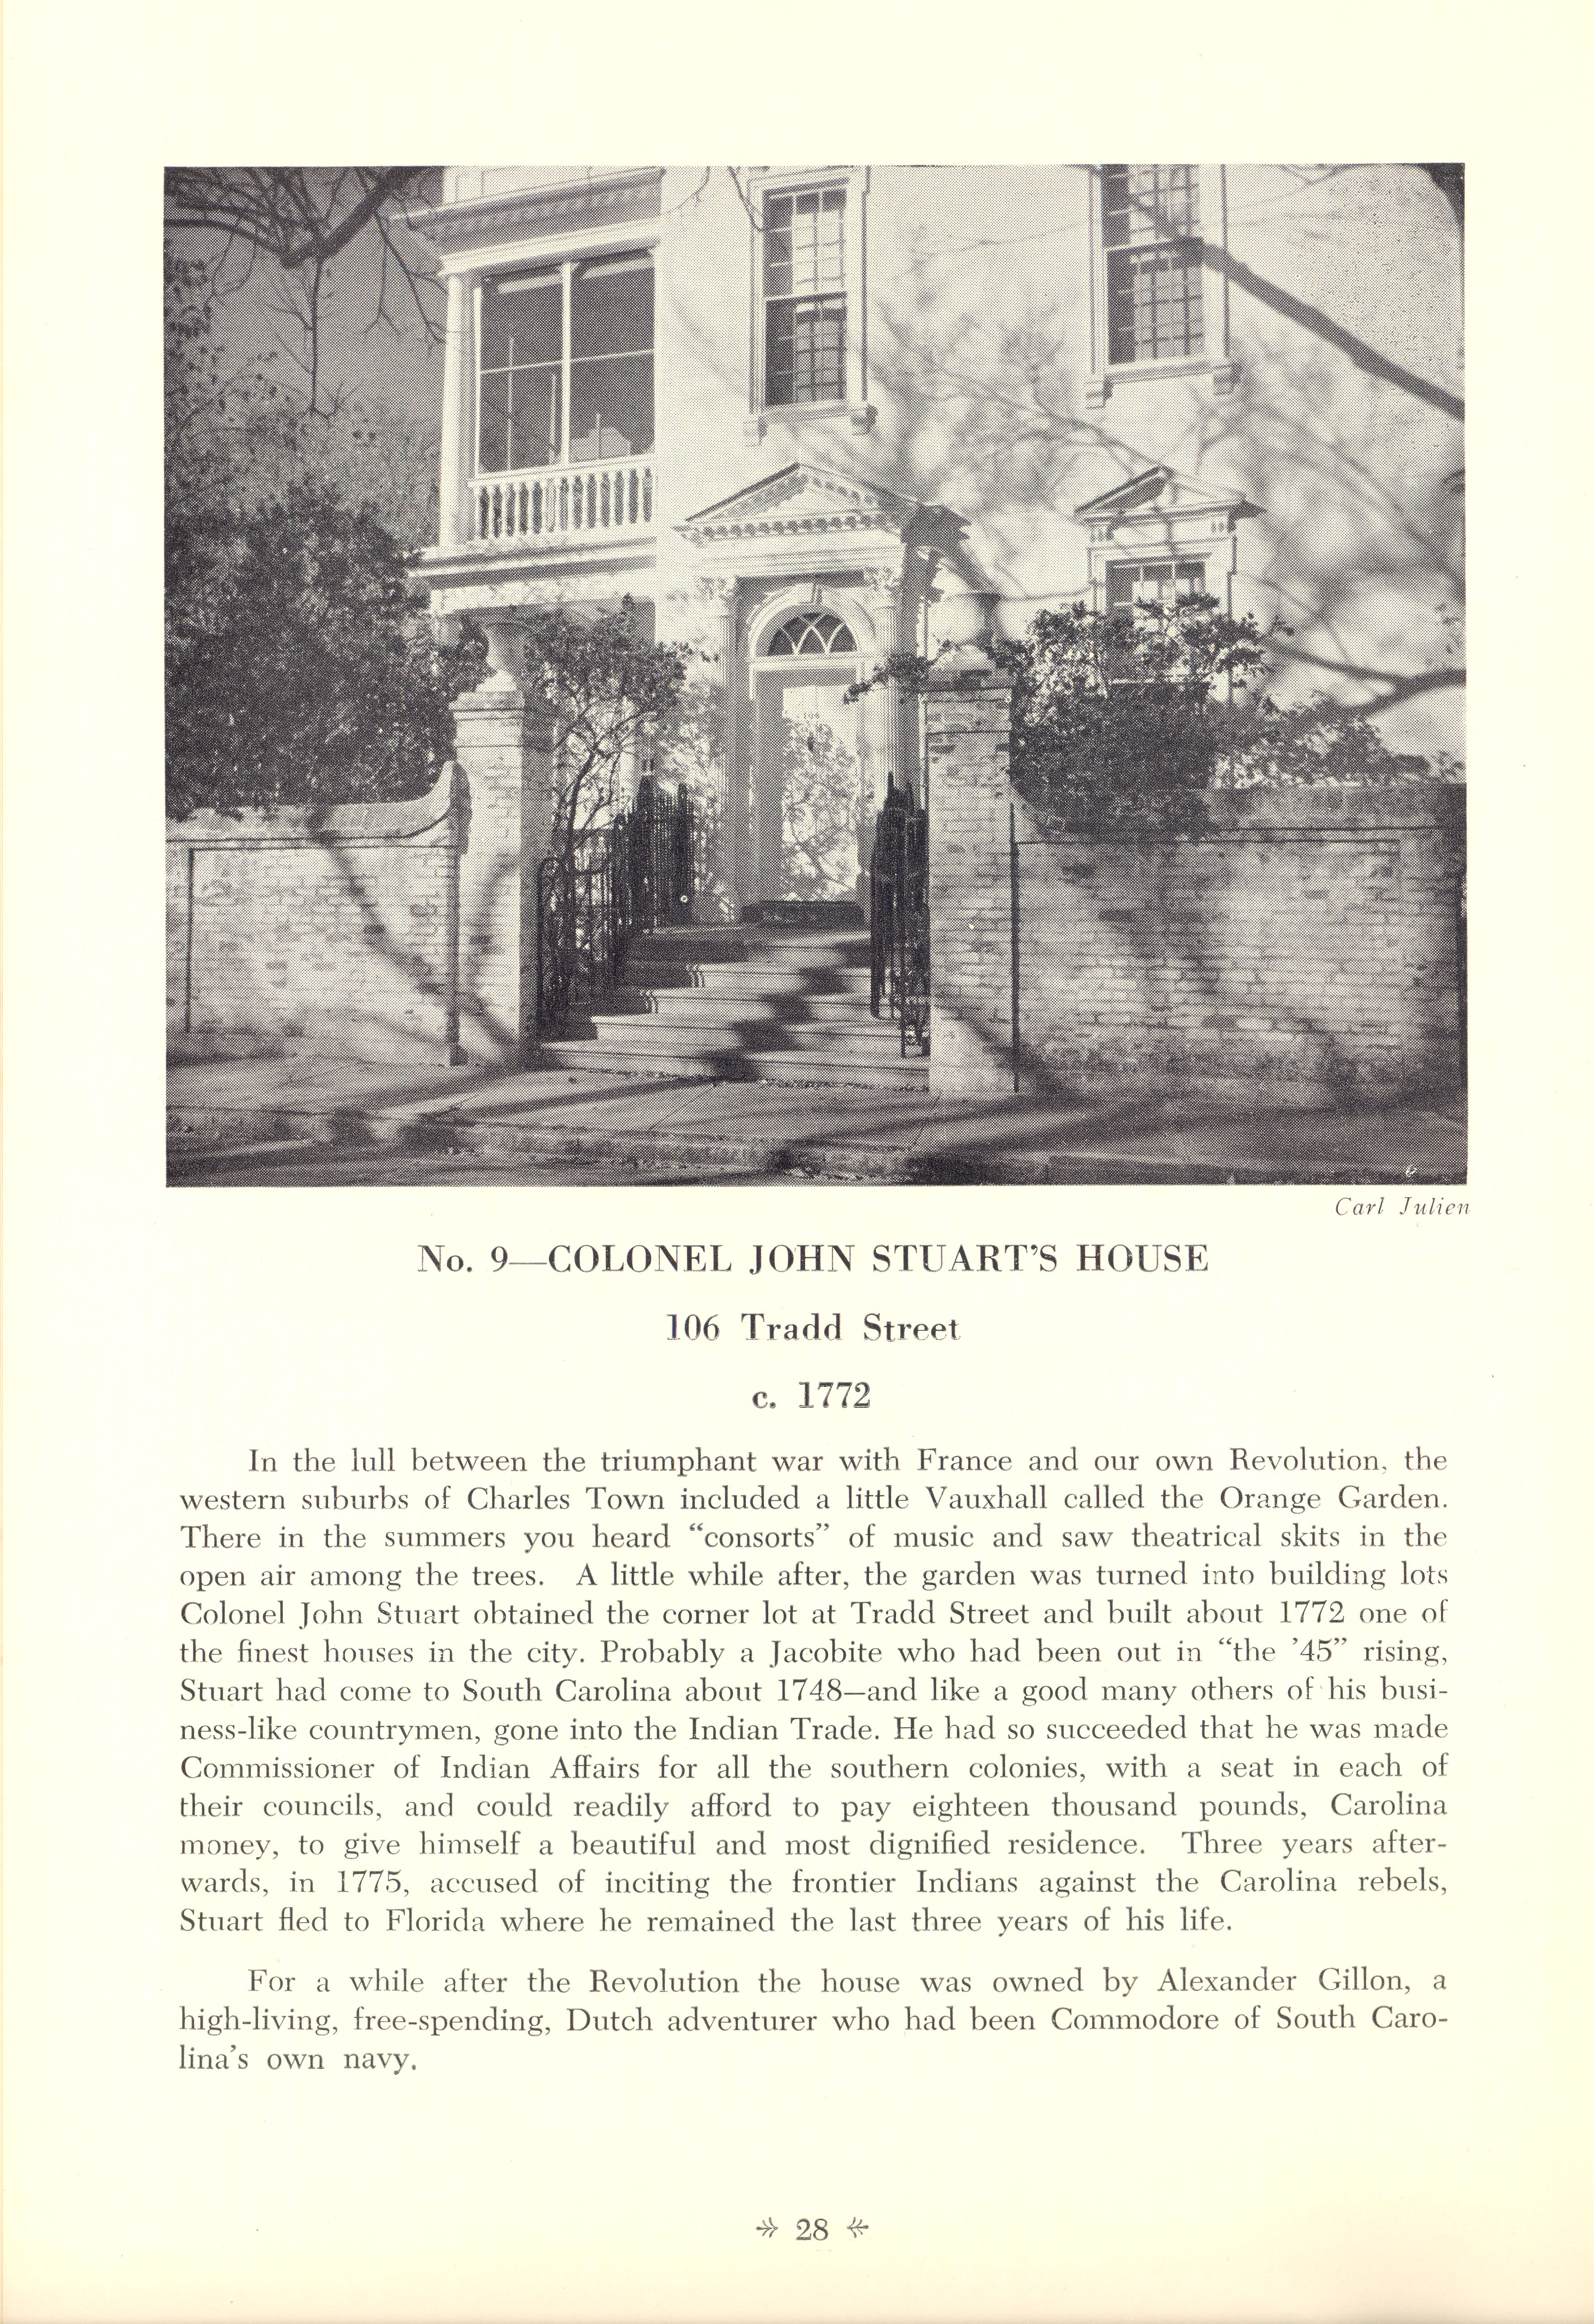 Page 28:  No. 9 - Colonel John Stuart's House, 106 Tradd Street, c. 1772